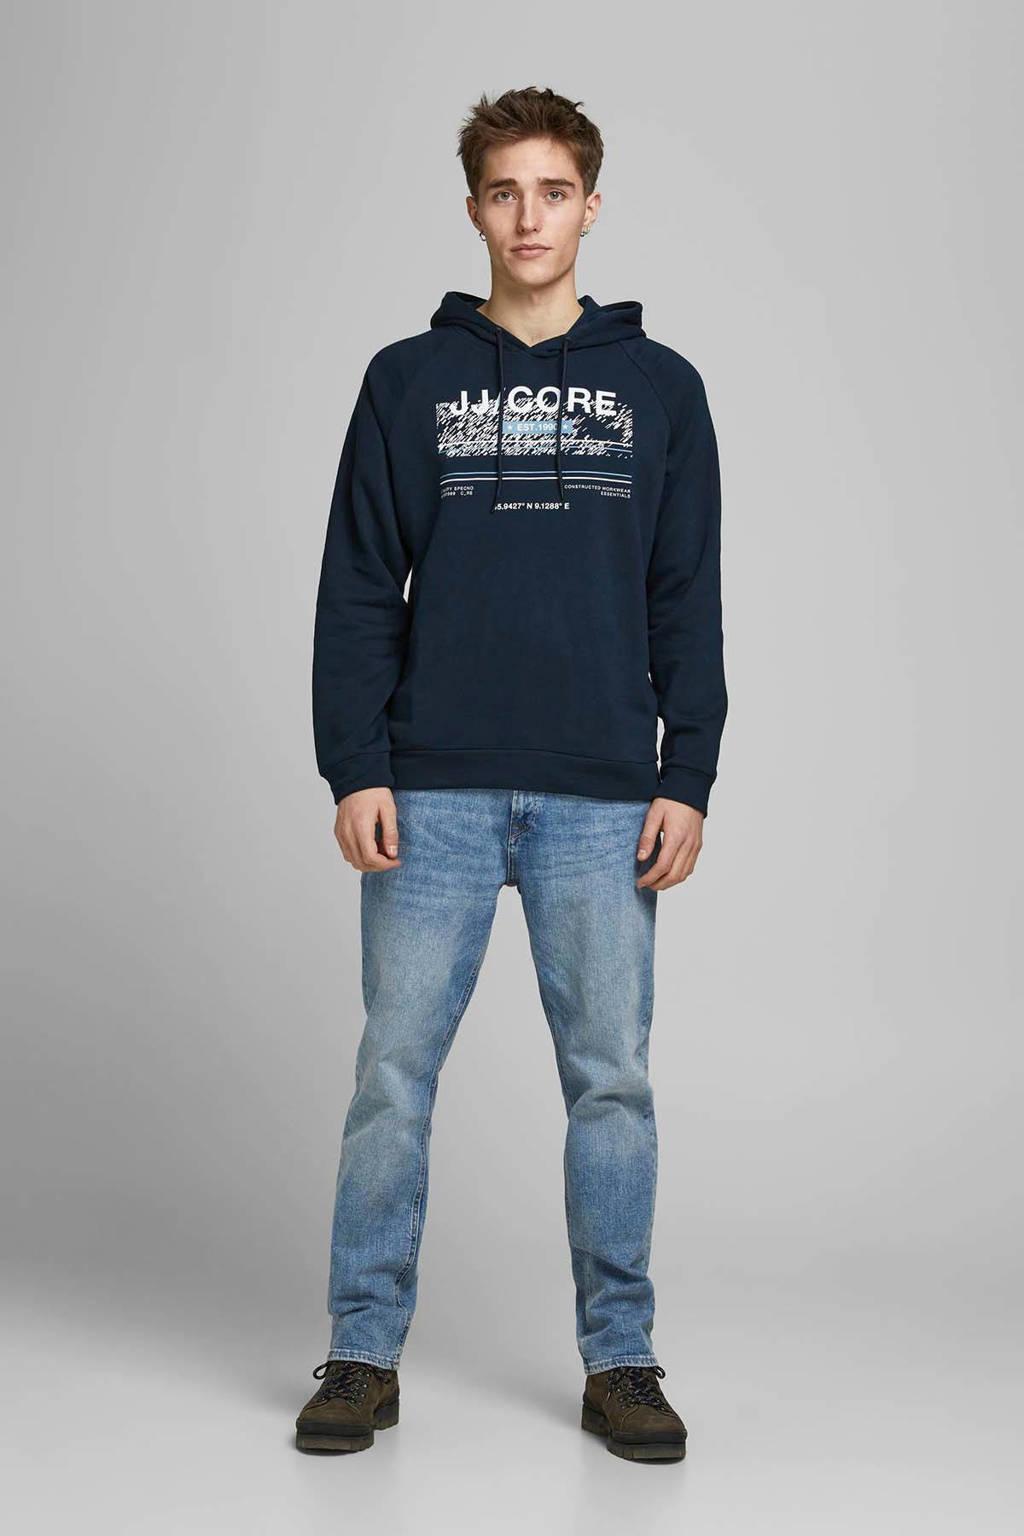 JACK & JONES CORE hoodie met printopdruk donkerblauw, Donkerblauw